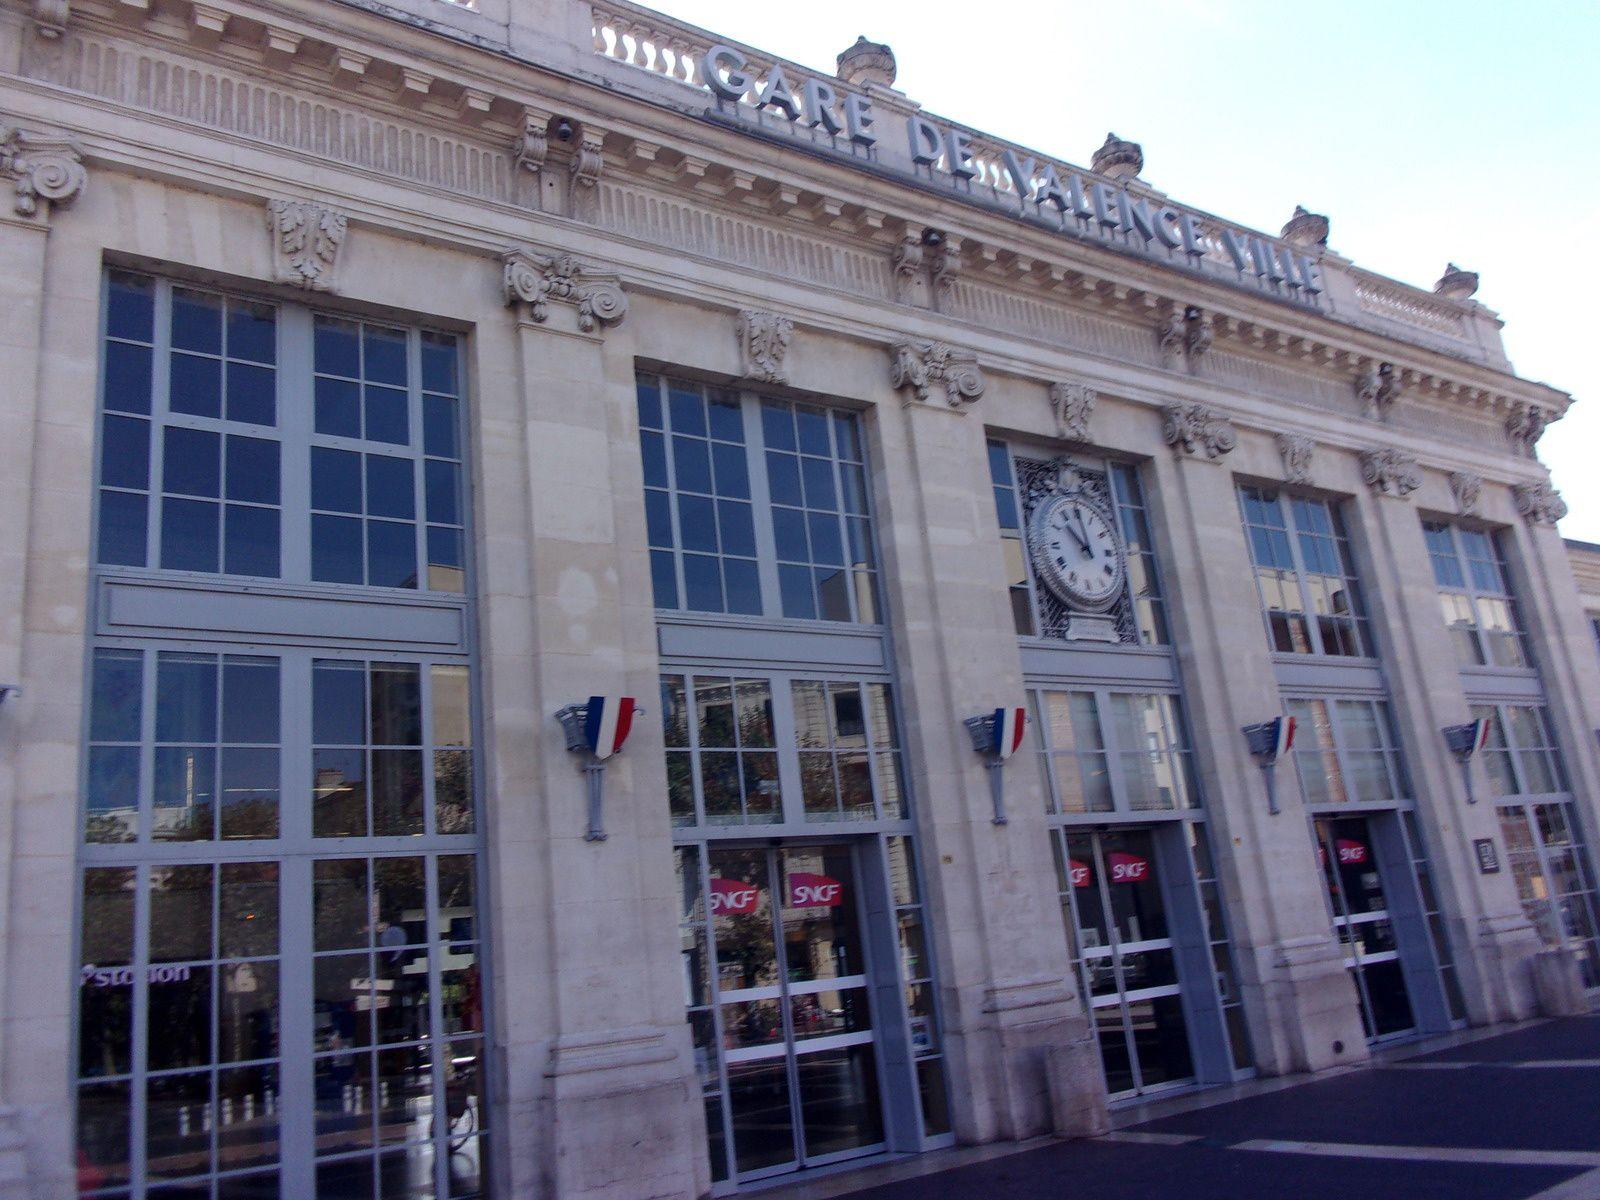 Terminus gare de Valence